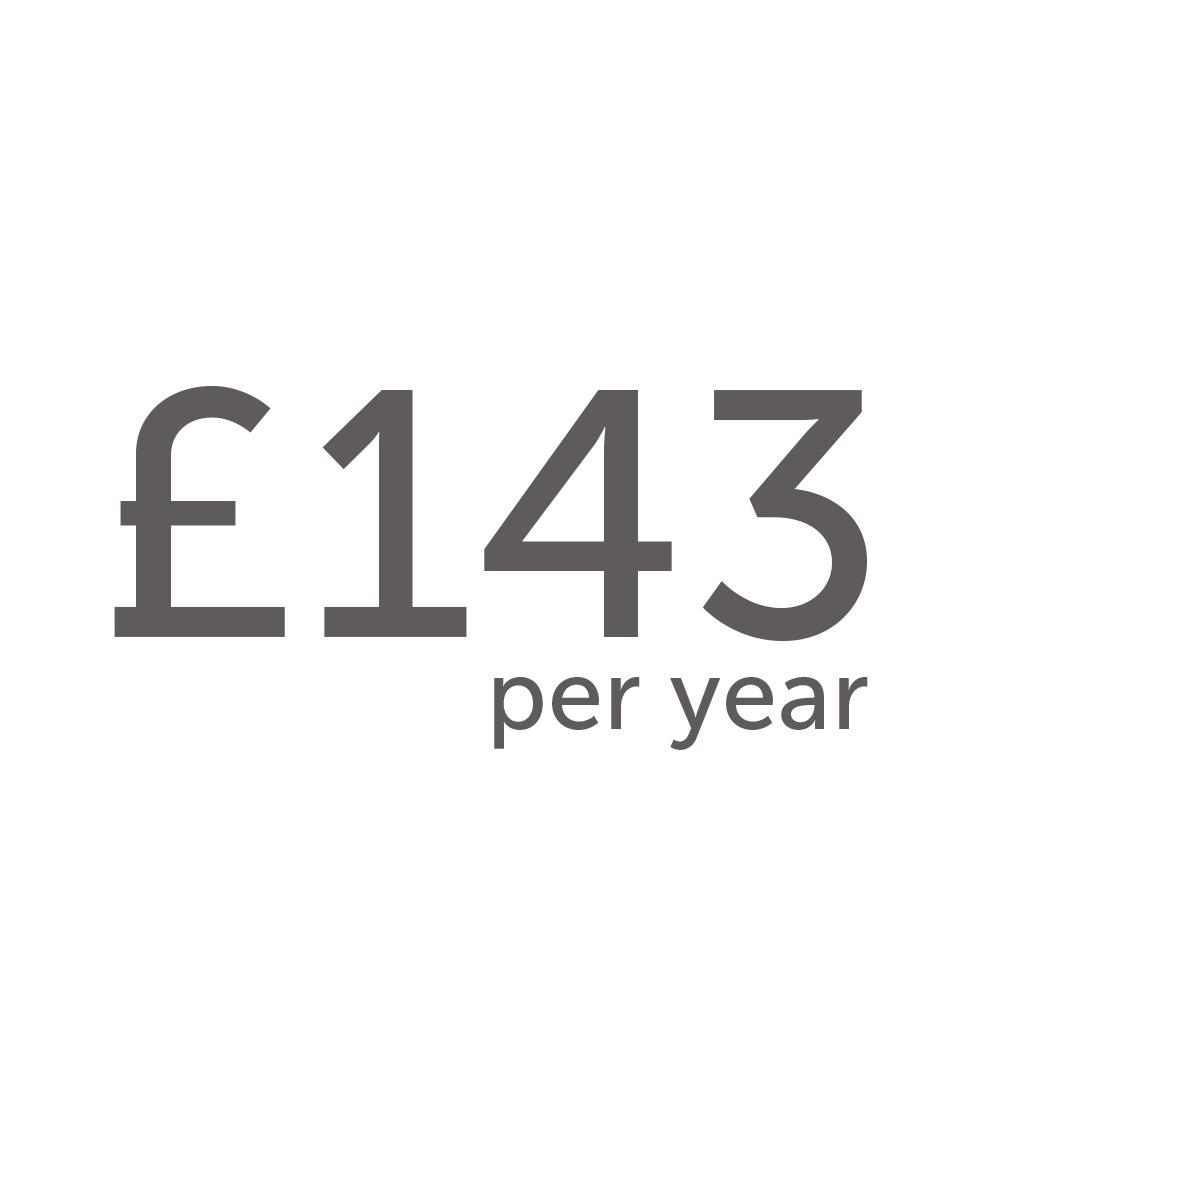 £143 per year